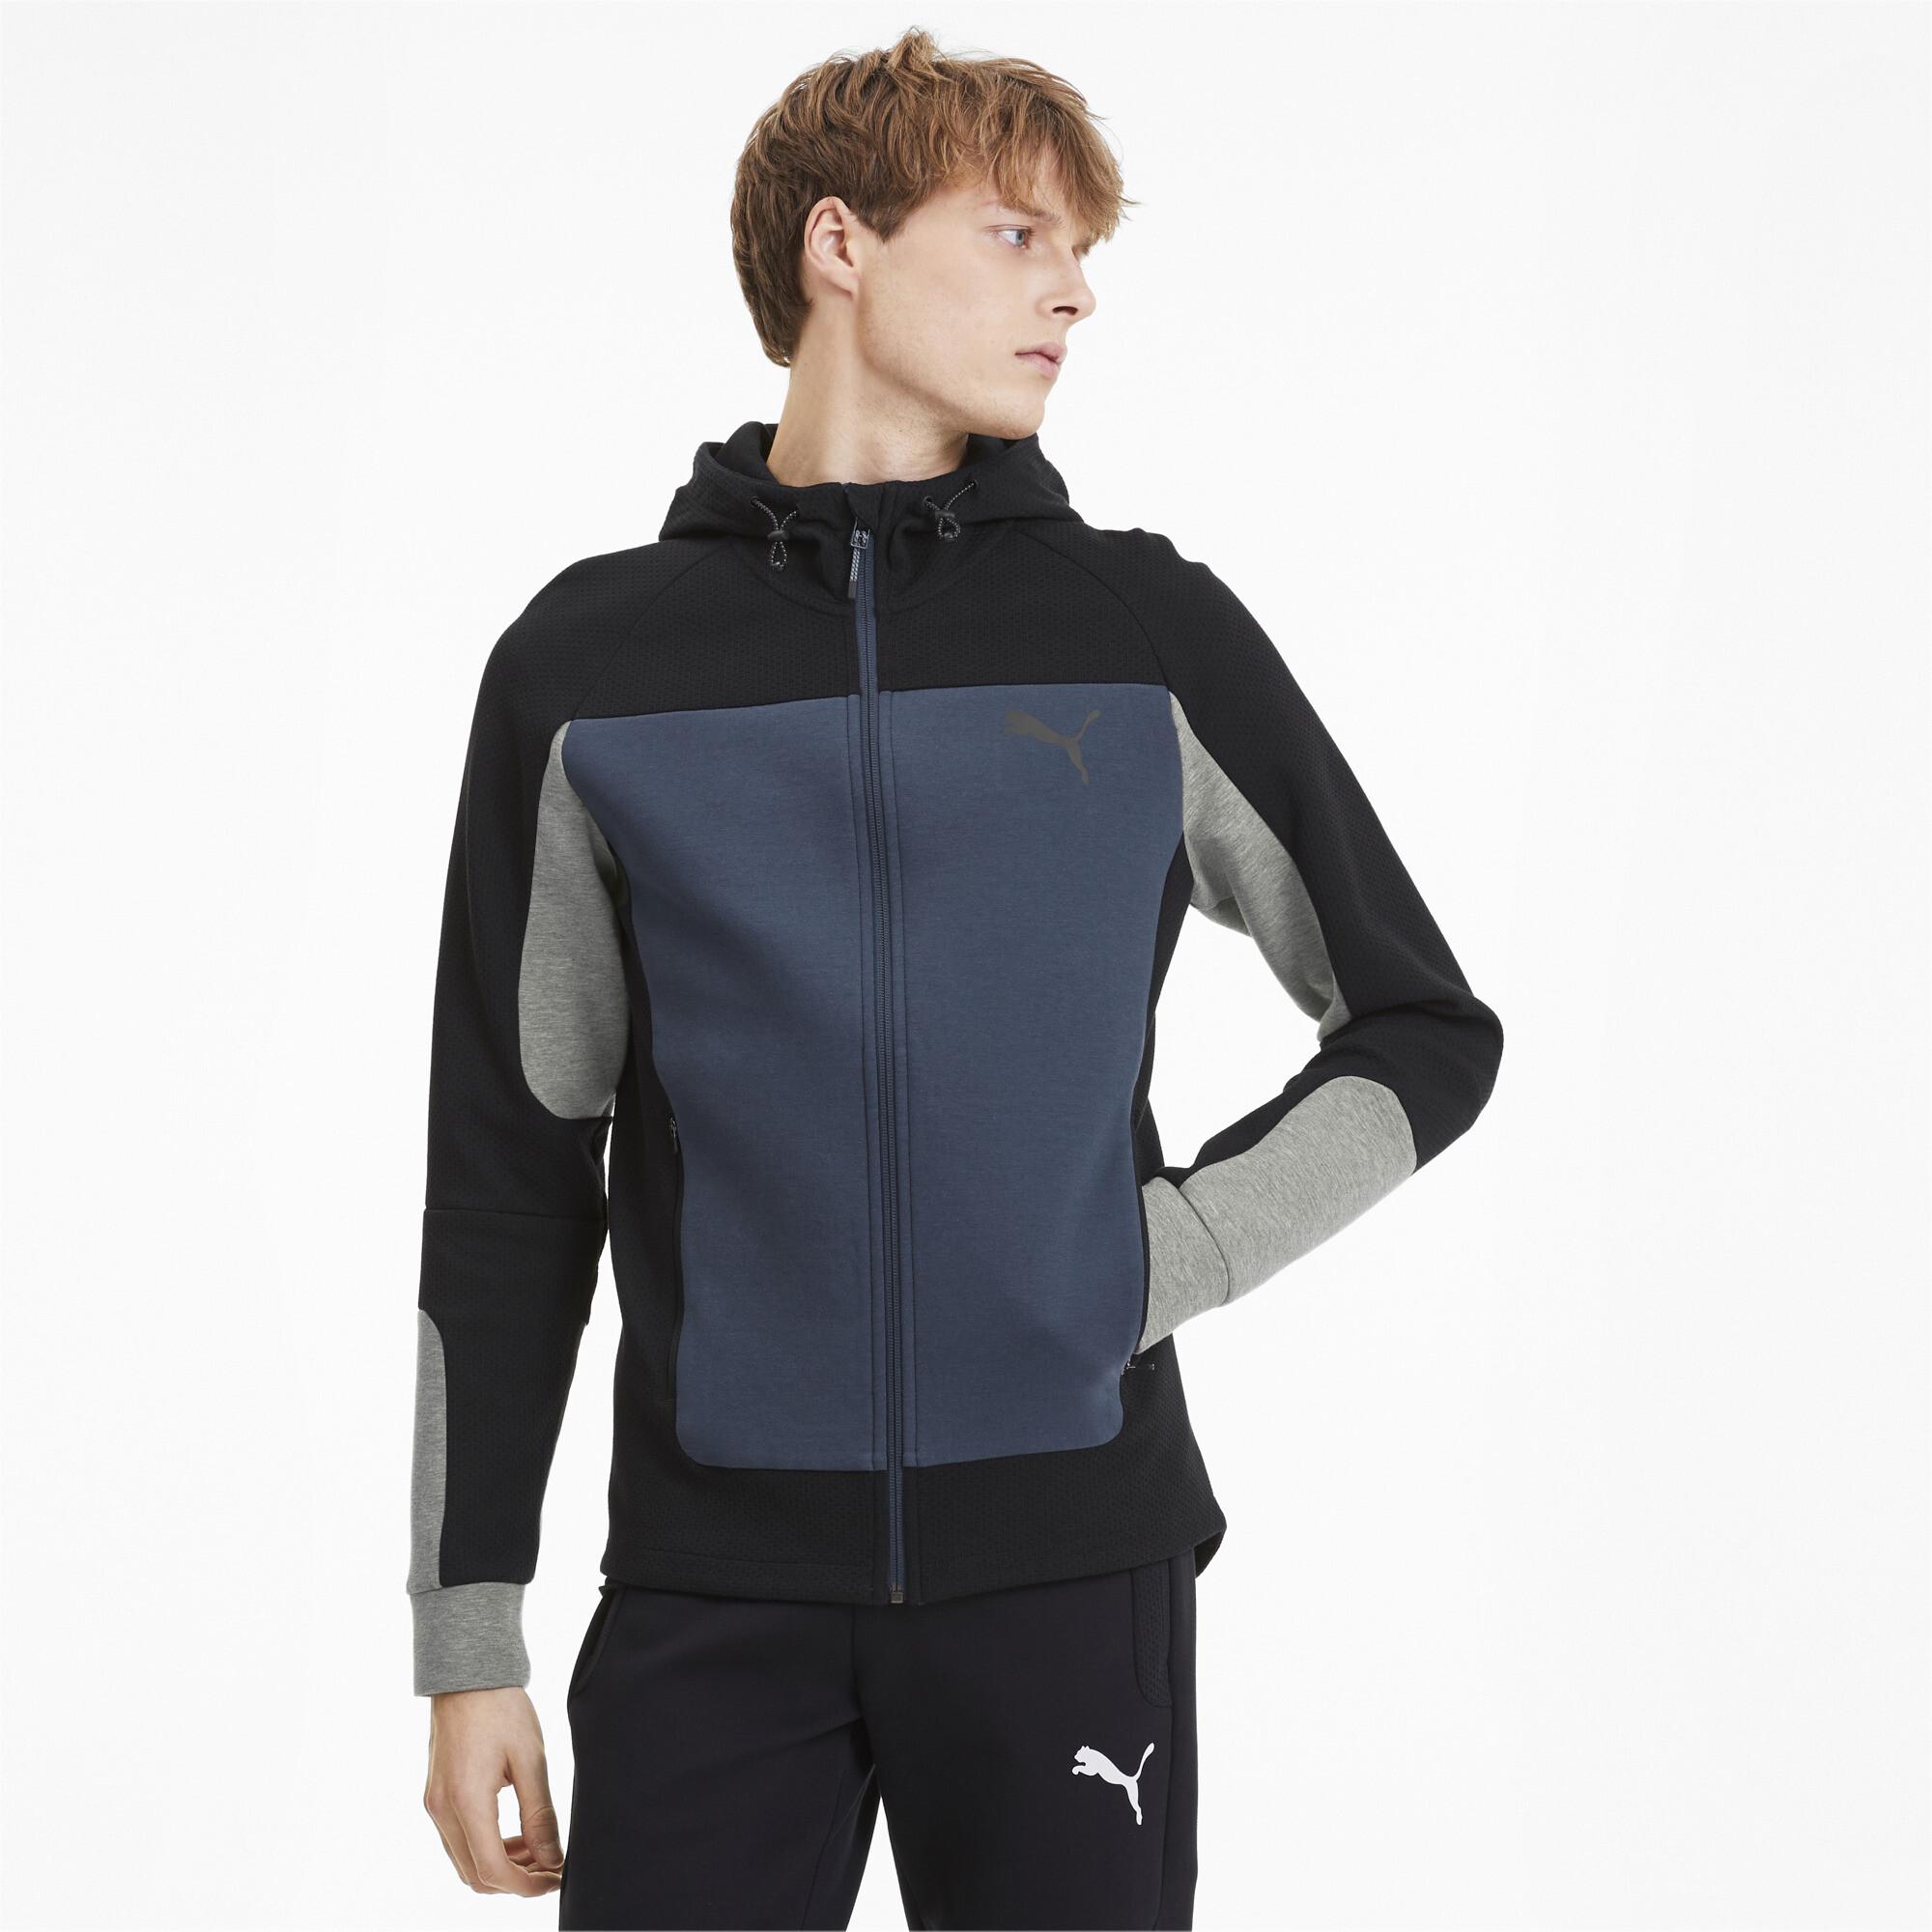 PUMA-Evostripe-Men-039-s-Hooded-Jacket-Men-Sweat-Basics thumbnail 4